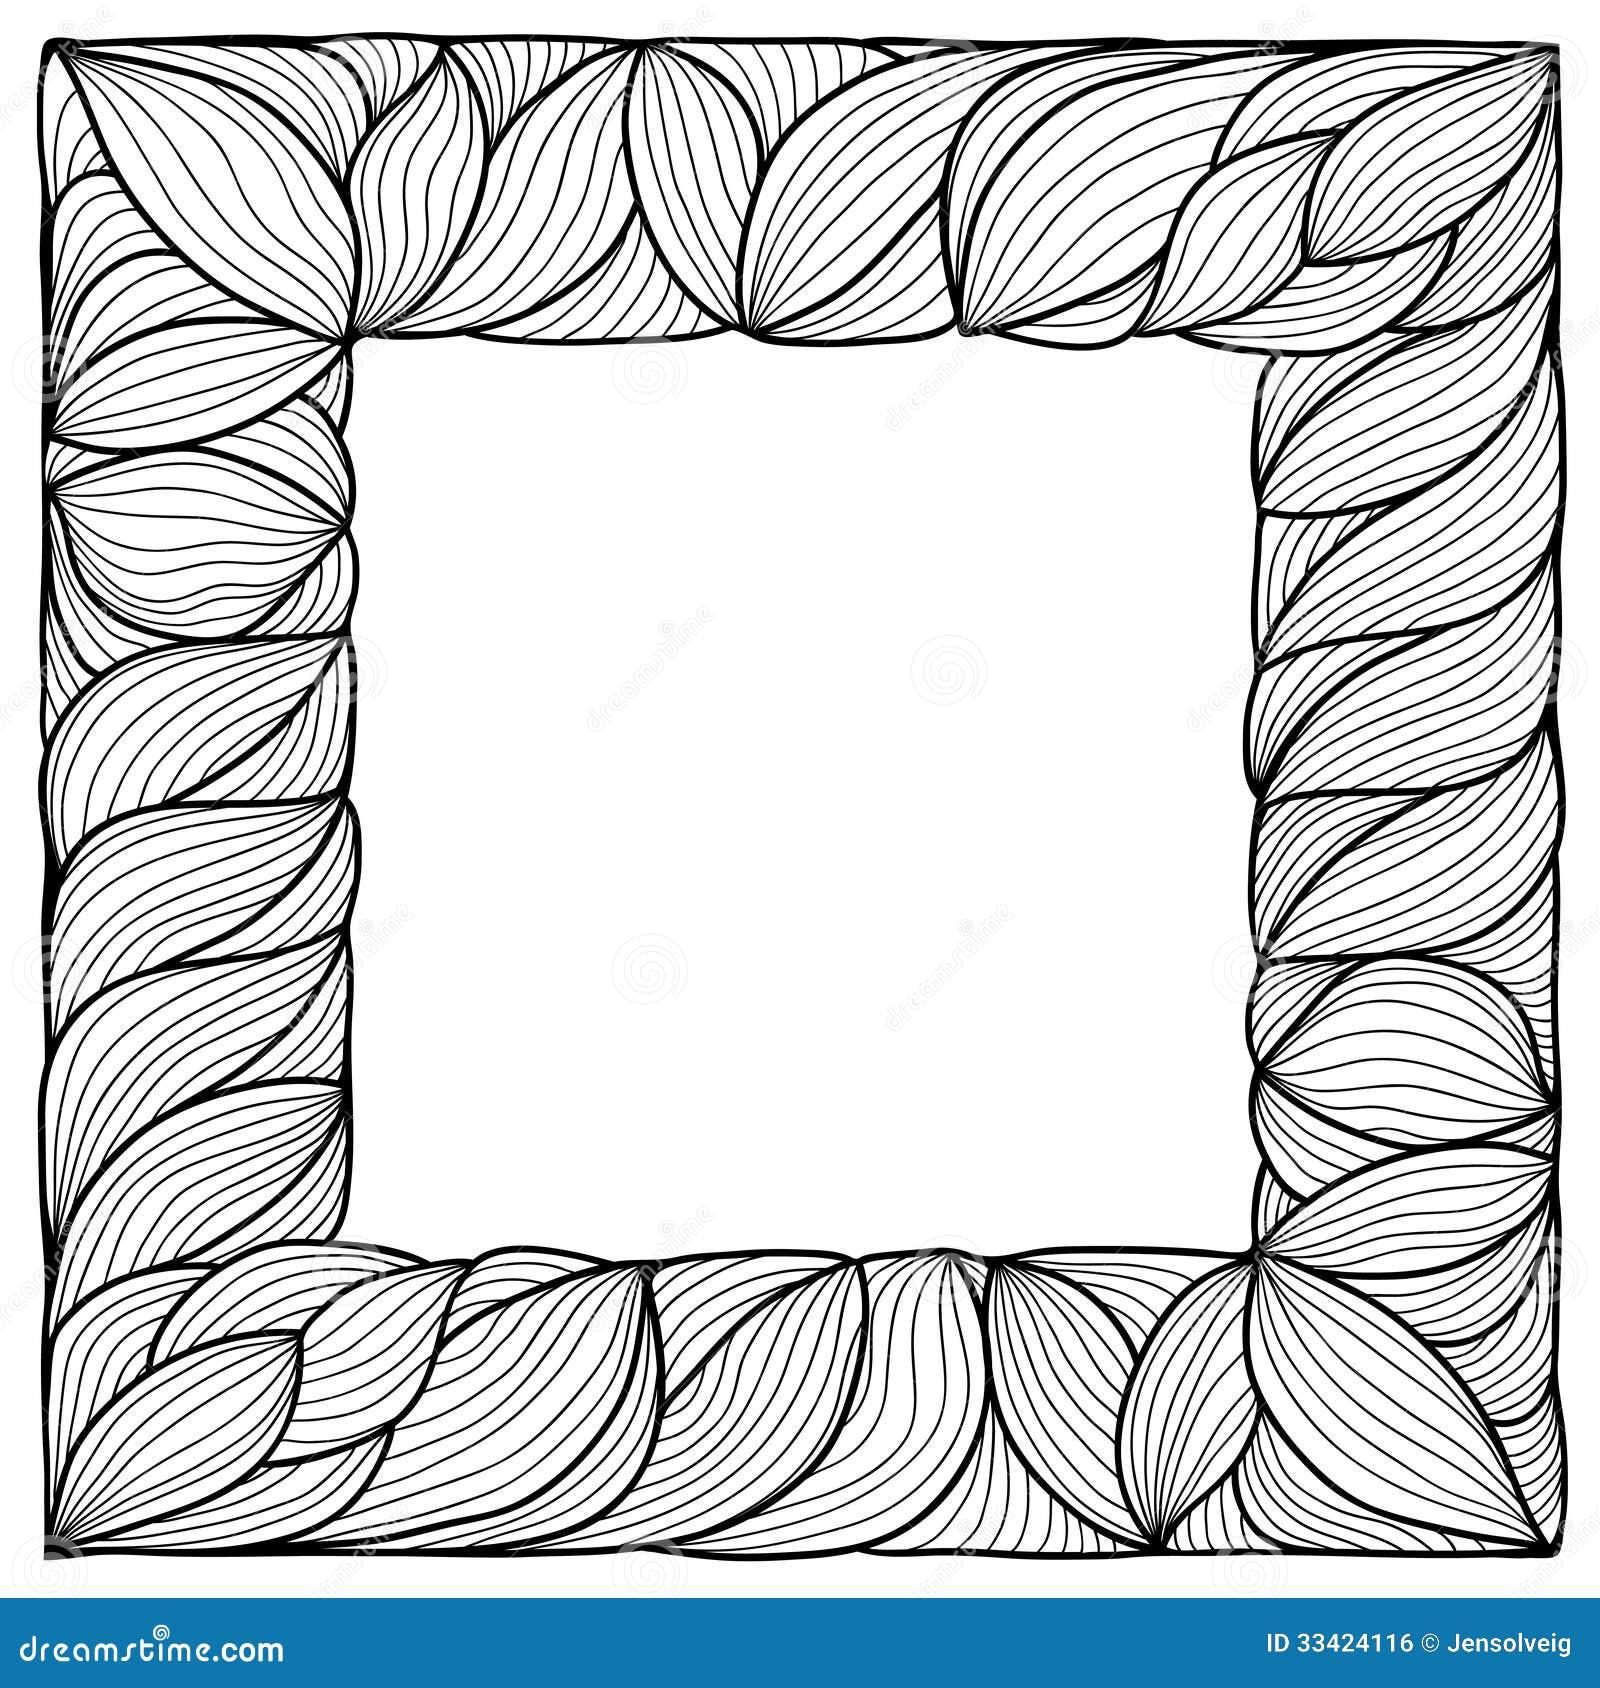 Hand drawn vector frame stock vector. Illustration of invitation ...